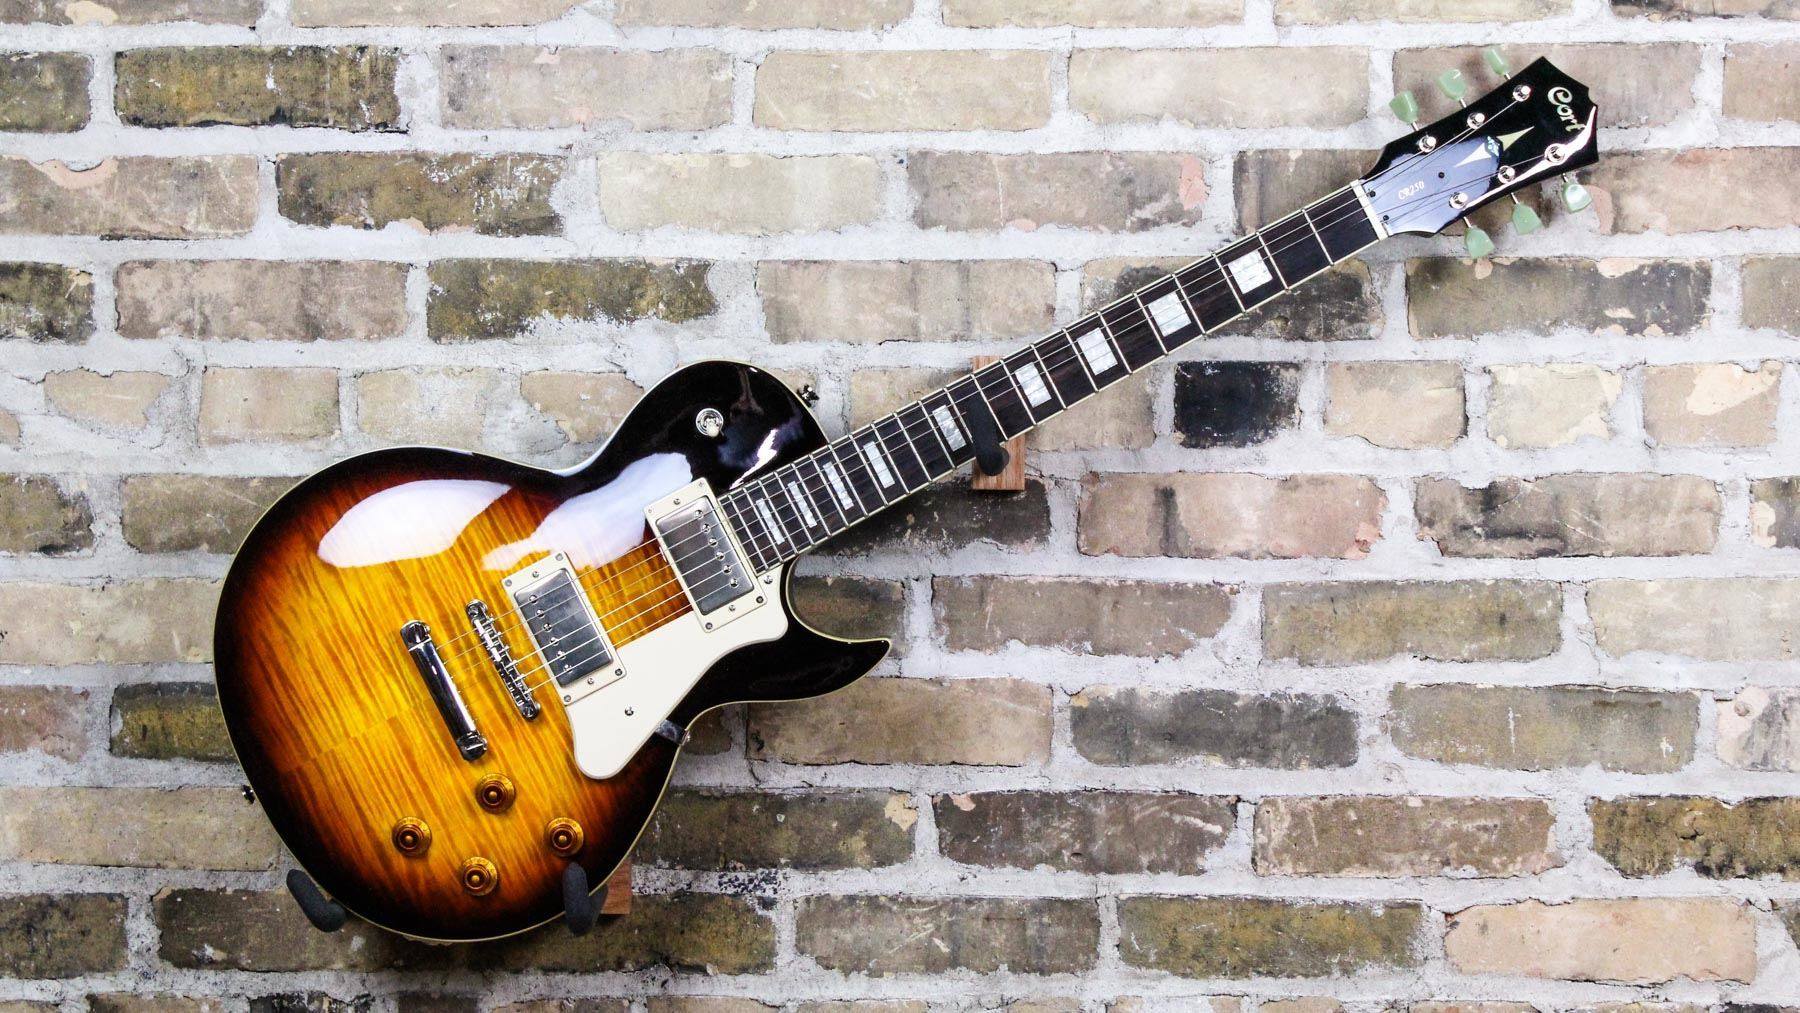 cort cr250 electric guitar cherry red sunburst cr 250 ts250 ebay. Black Bedroom Furniture Sets. Home Design Ideas